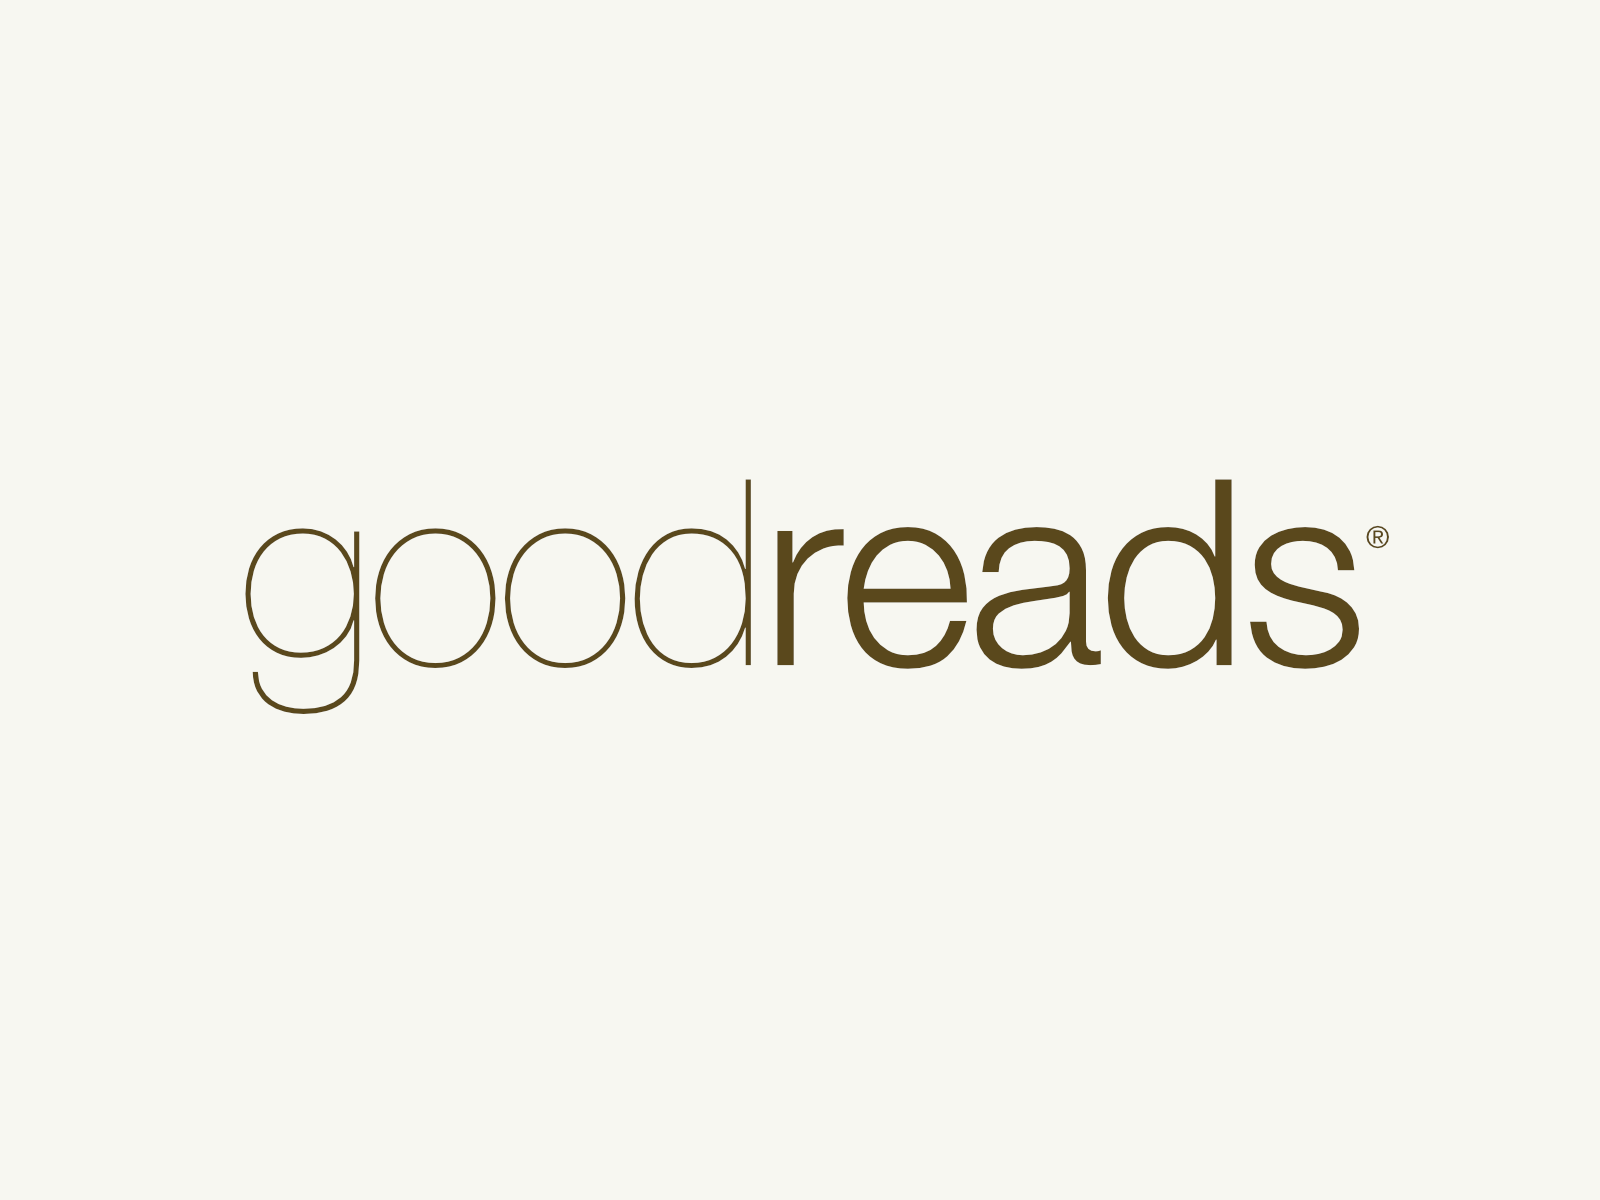 Goodreads logo 1600x1200